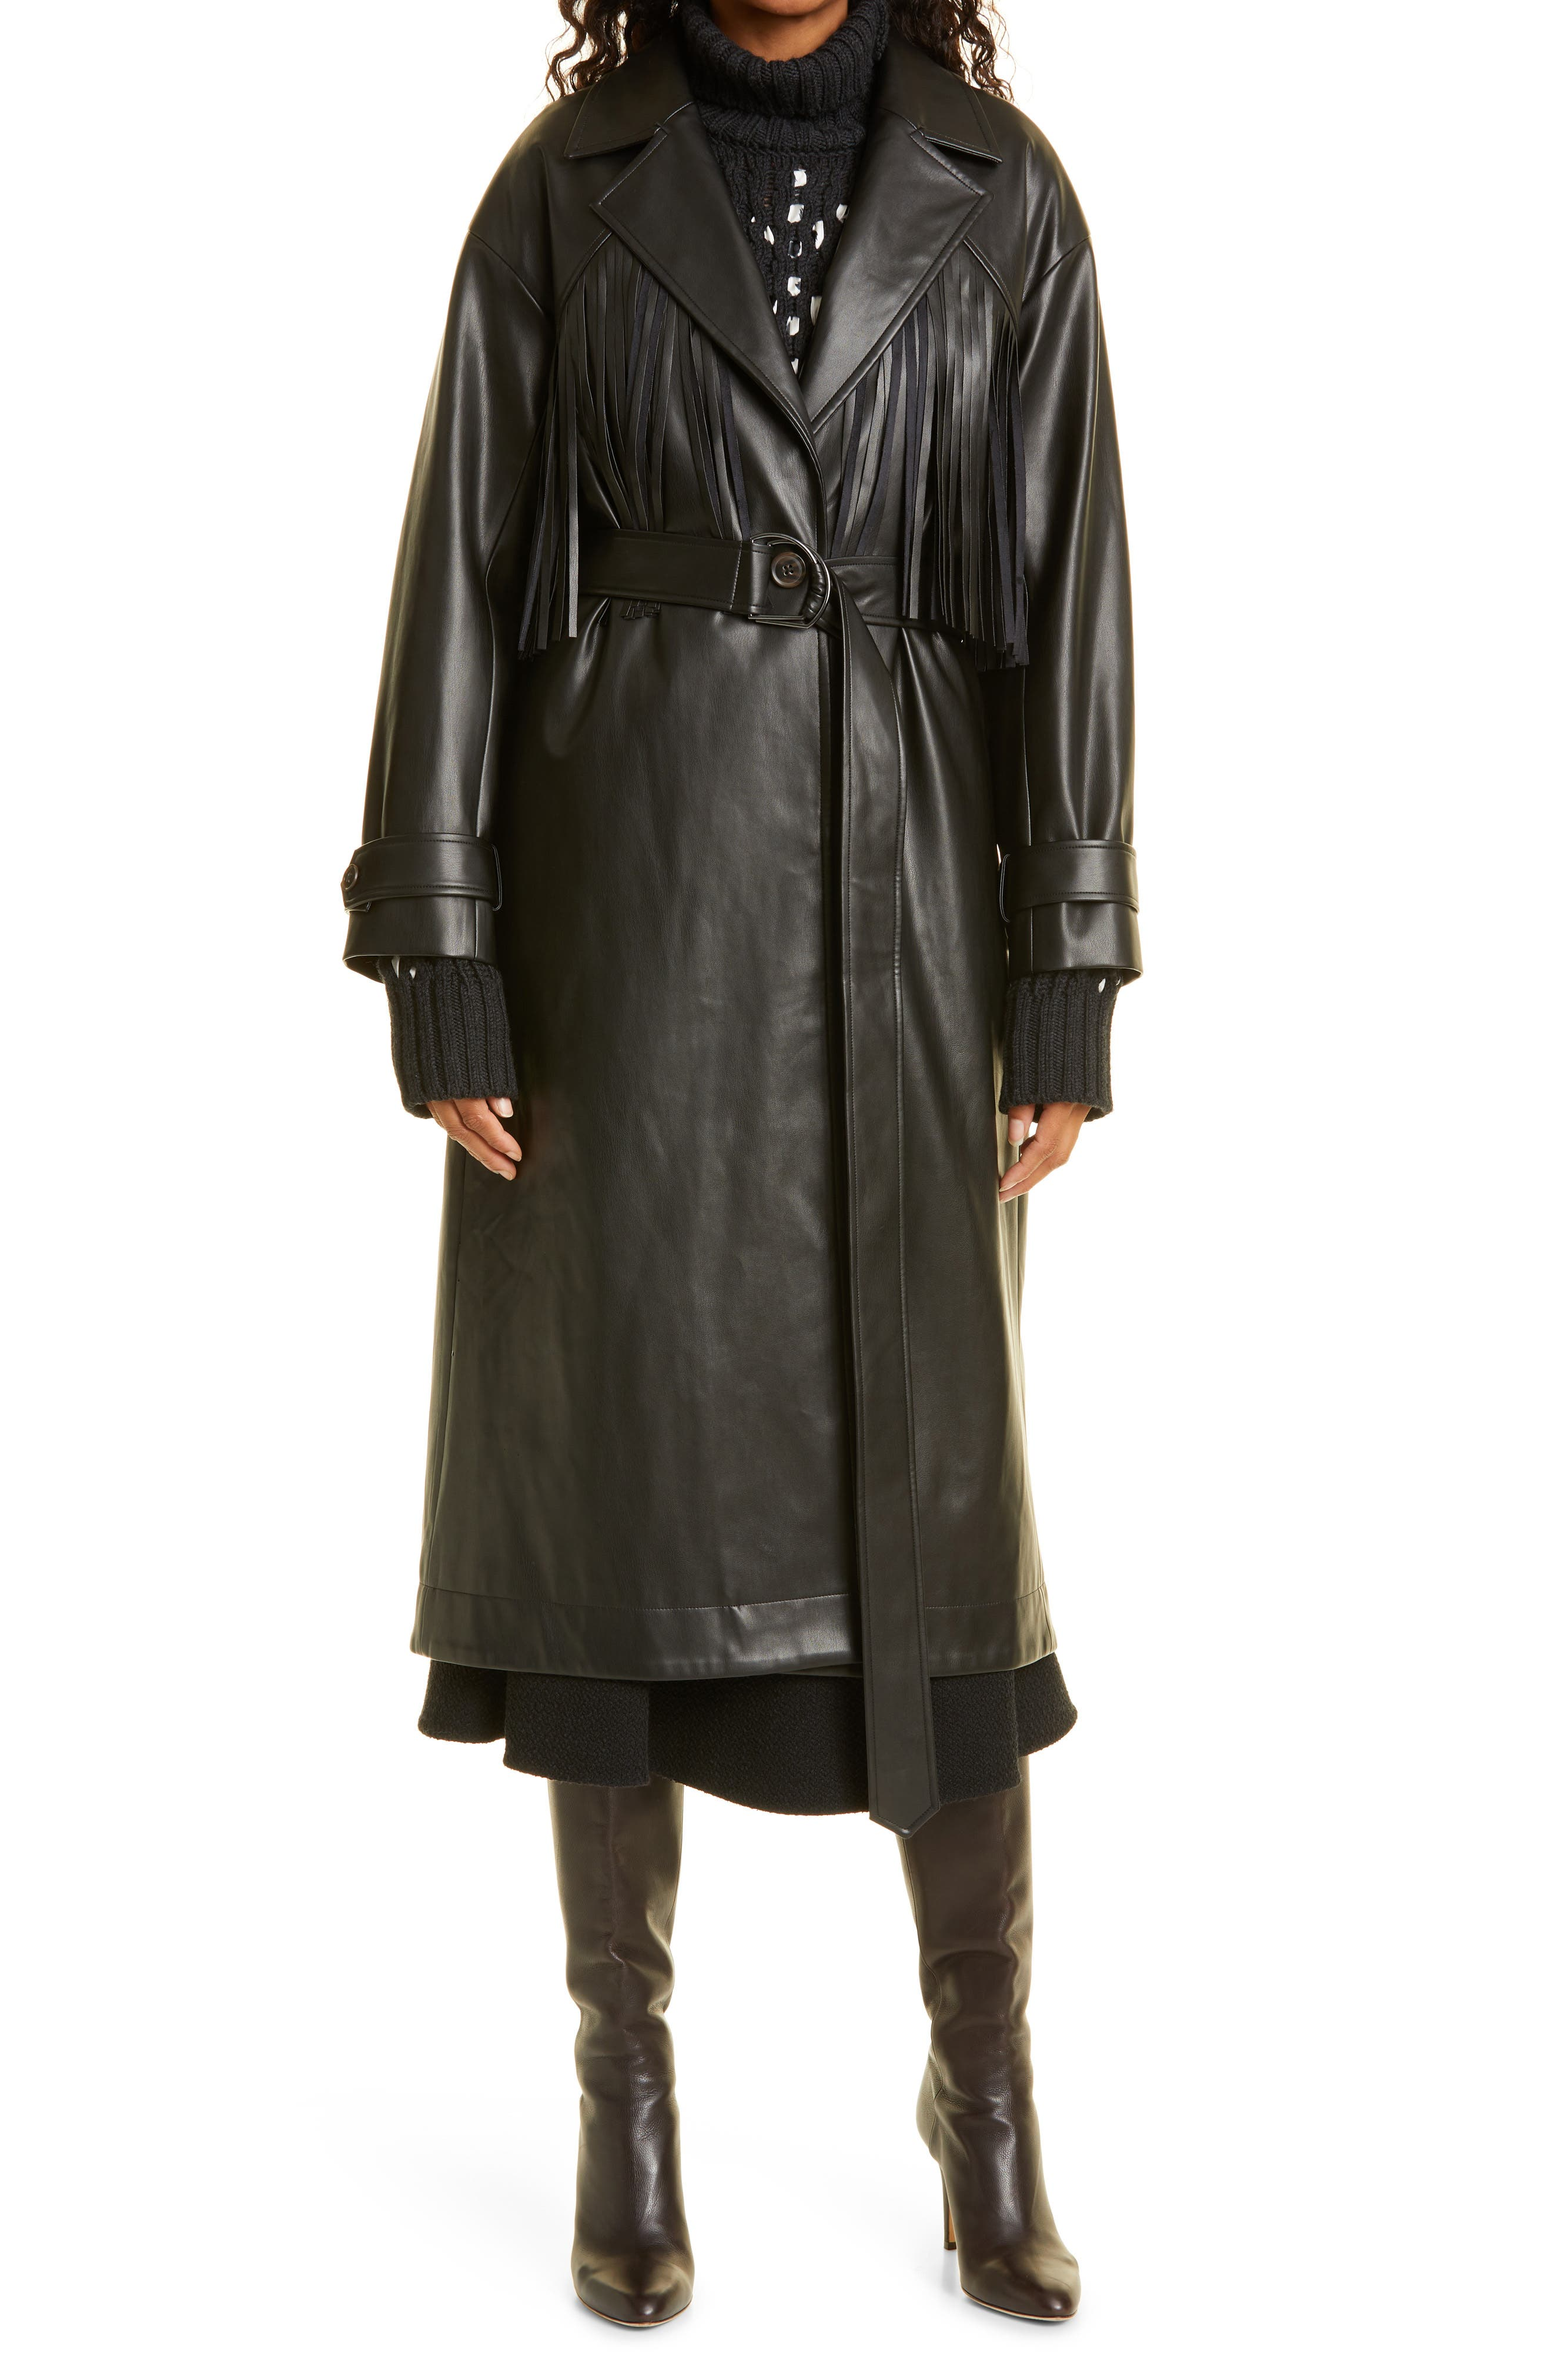 Women's Jason Wu Faux Leather Fringe Detail Coat